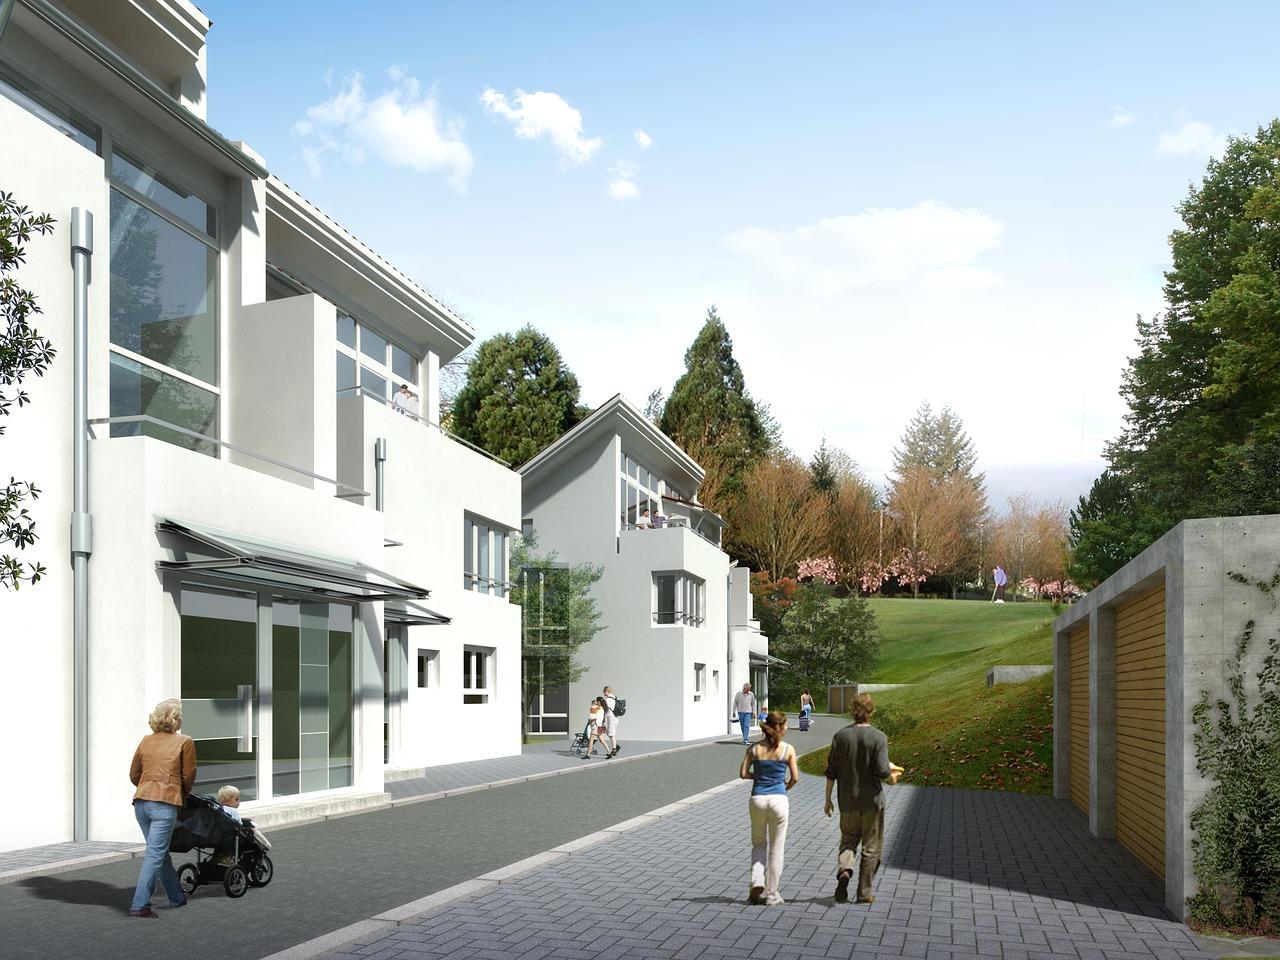 Quels sont les avantages d'un logement intelligent ?